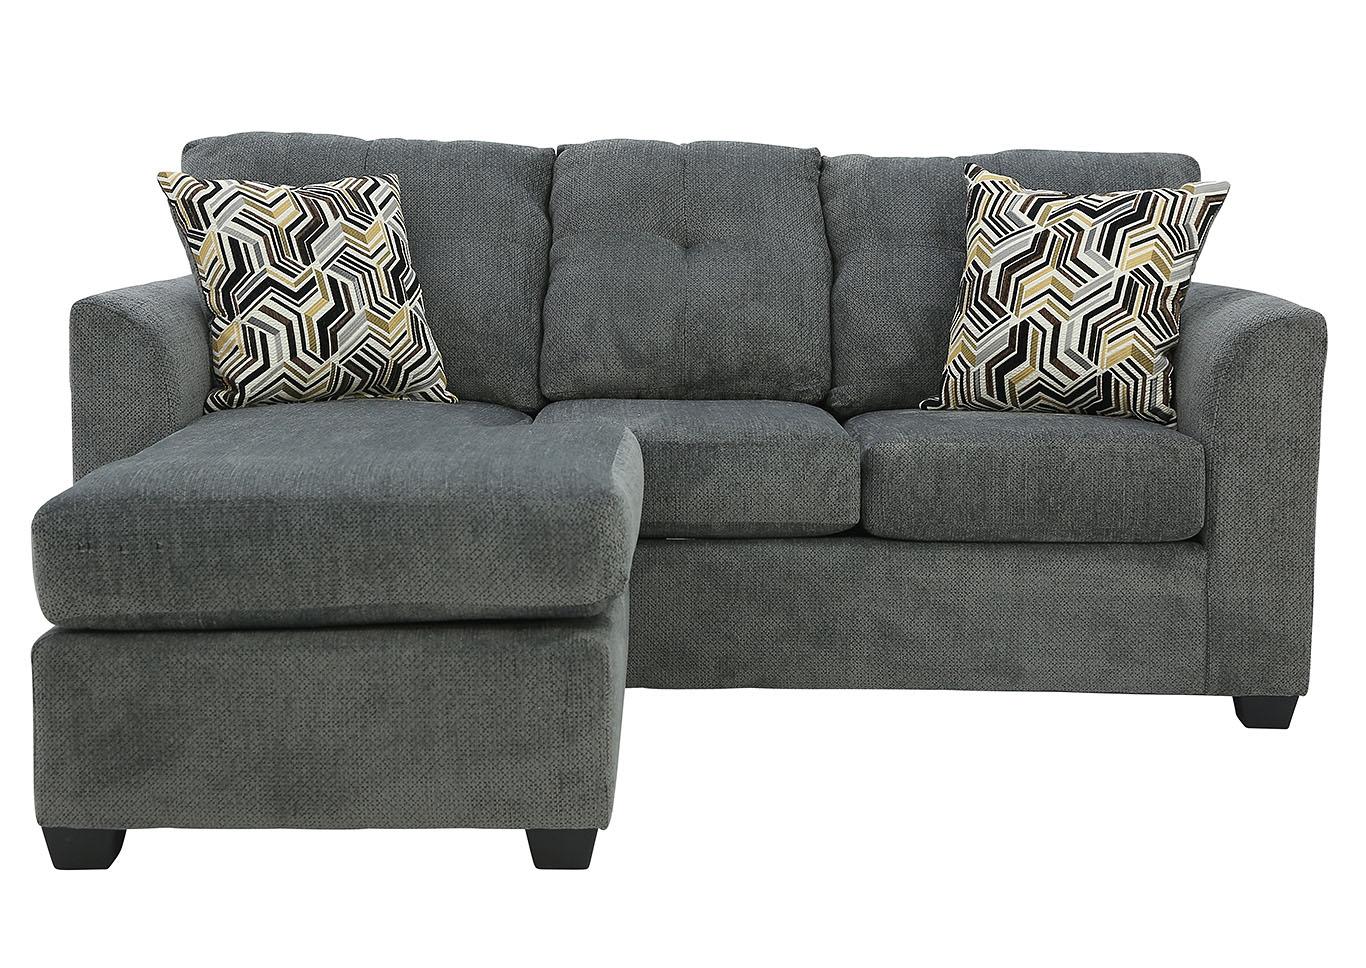 Magnificent Ivan Smith Kelly Gray Sofa Chaise Inzonedesignstudio Interior Chair Design Inzonedesignstudiocom